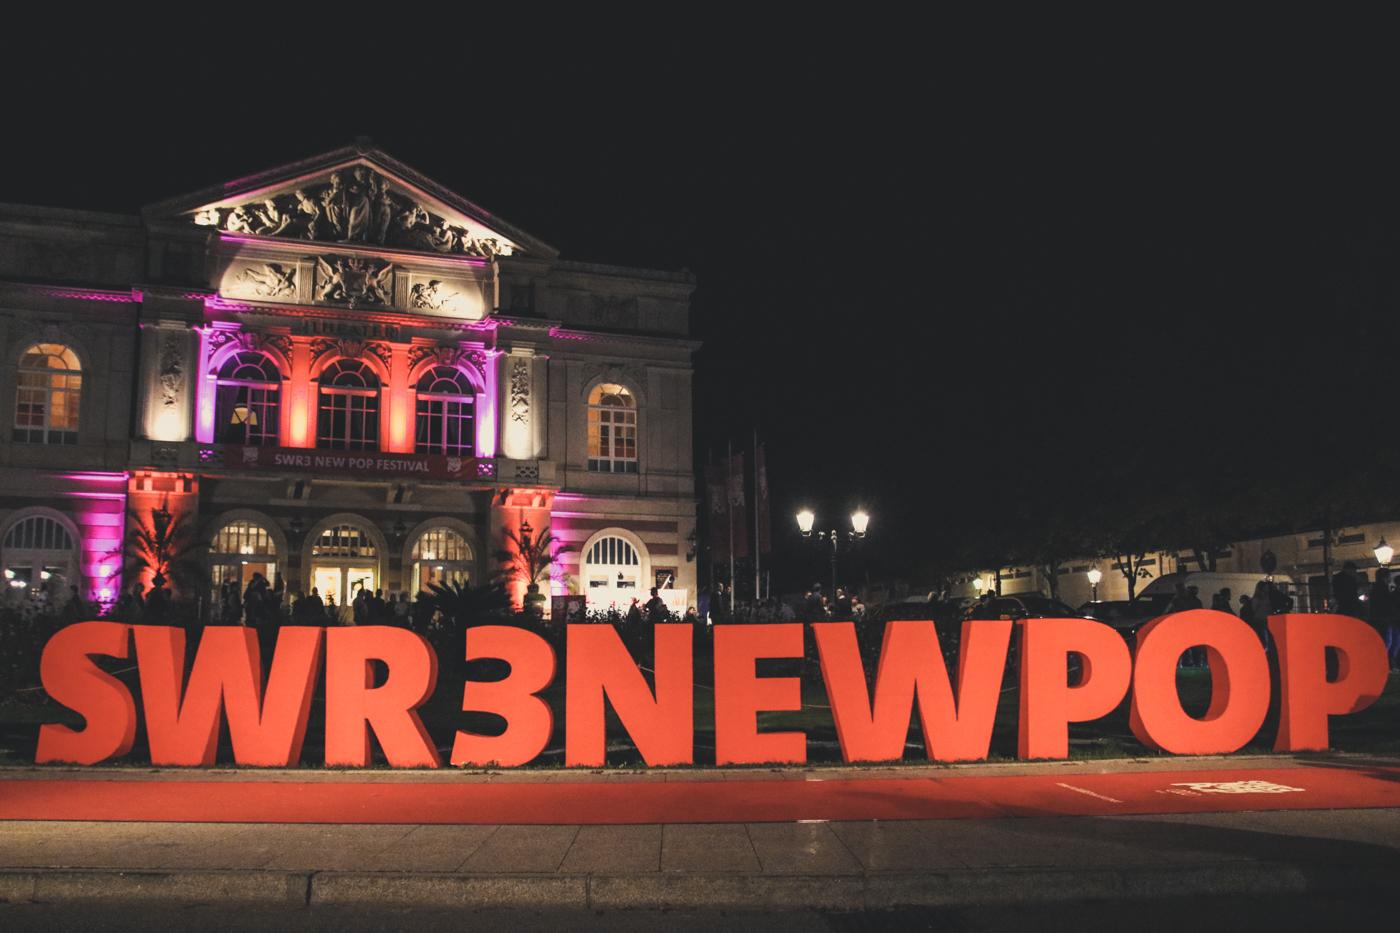 SWR3 NEW POP FESTIVAL in Baden Baden - Recap & Fotos